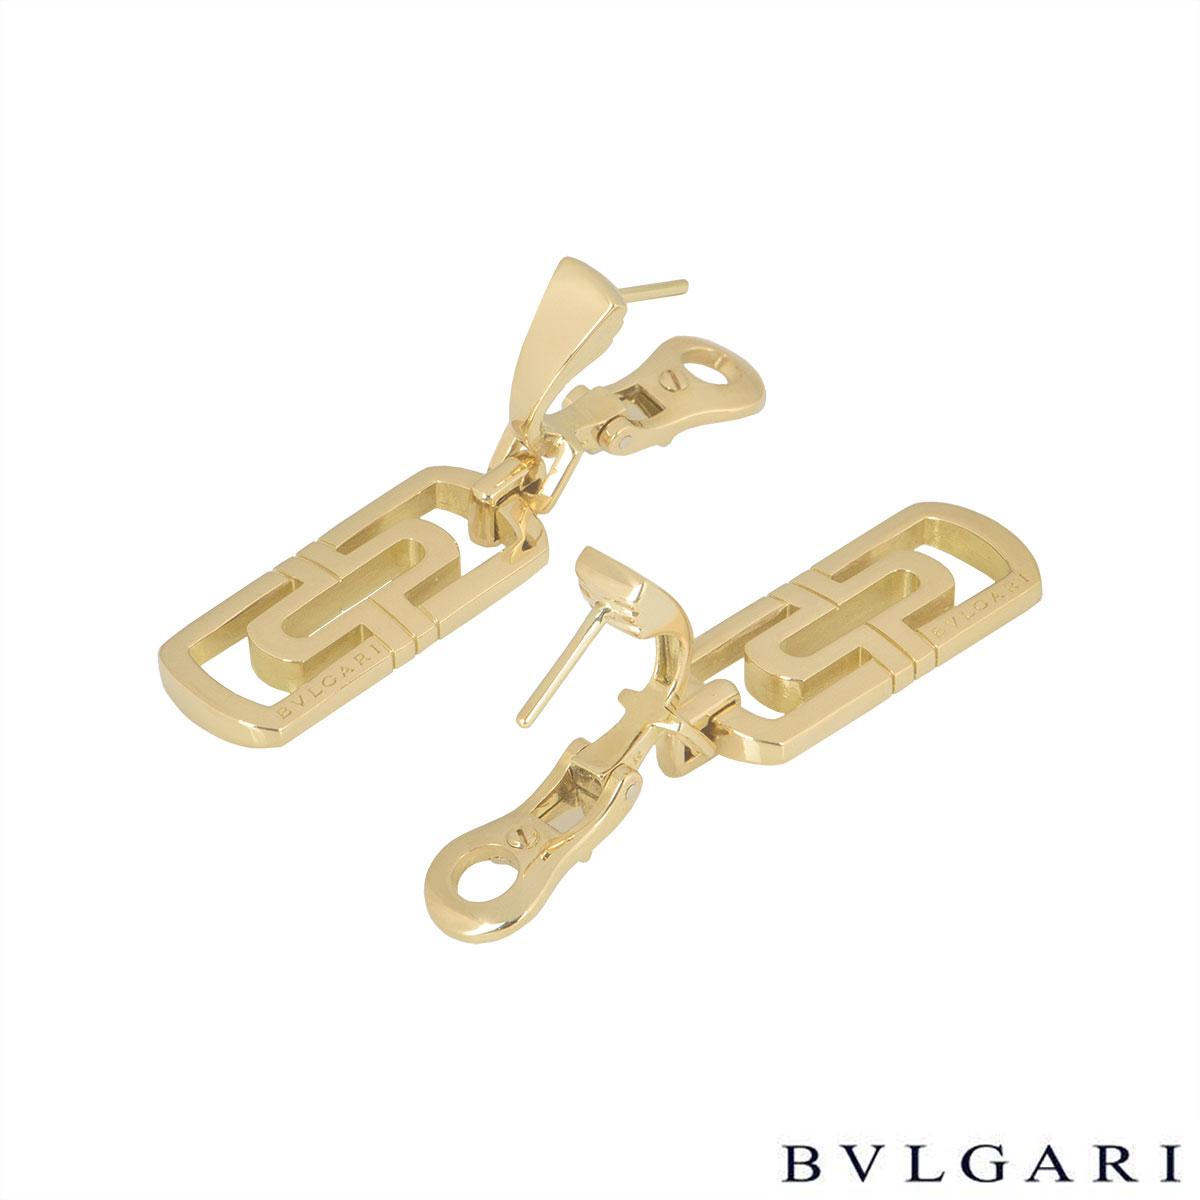 Bvlgari Yellow Gold Parentesi Drop Earrings